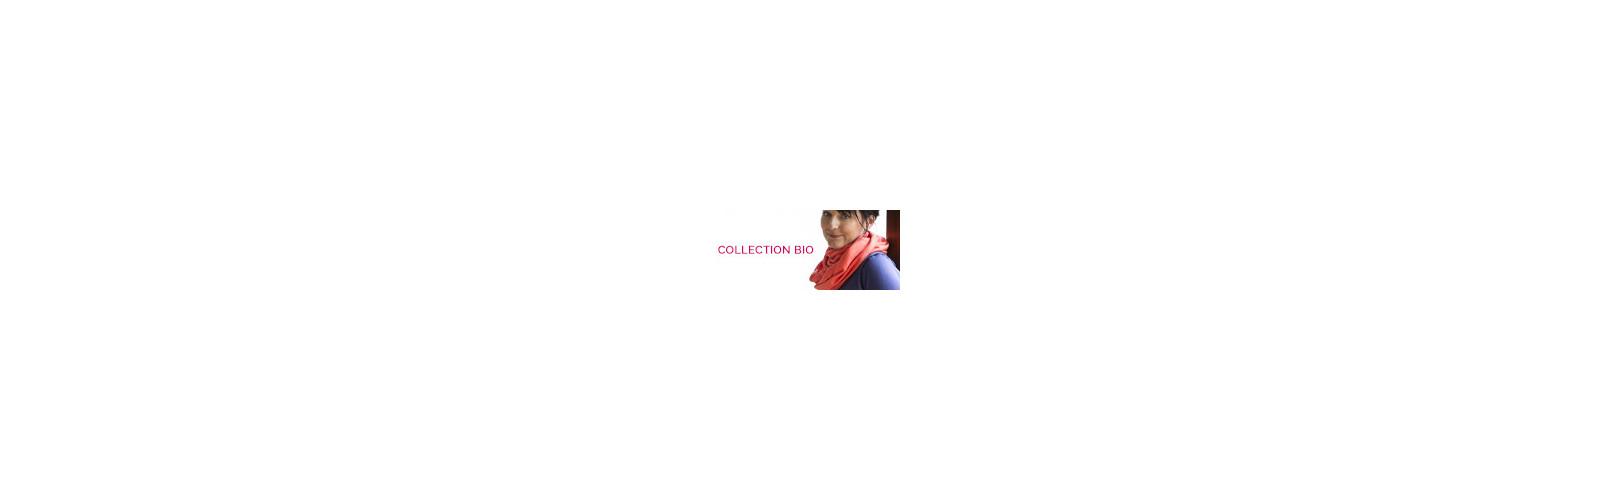 Collection Bio